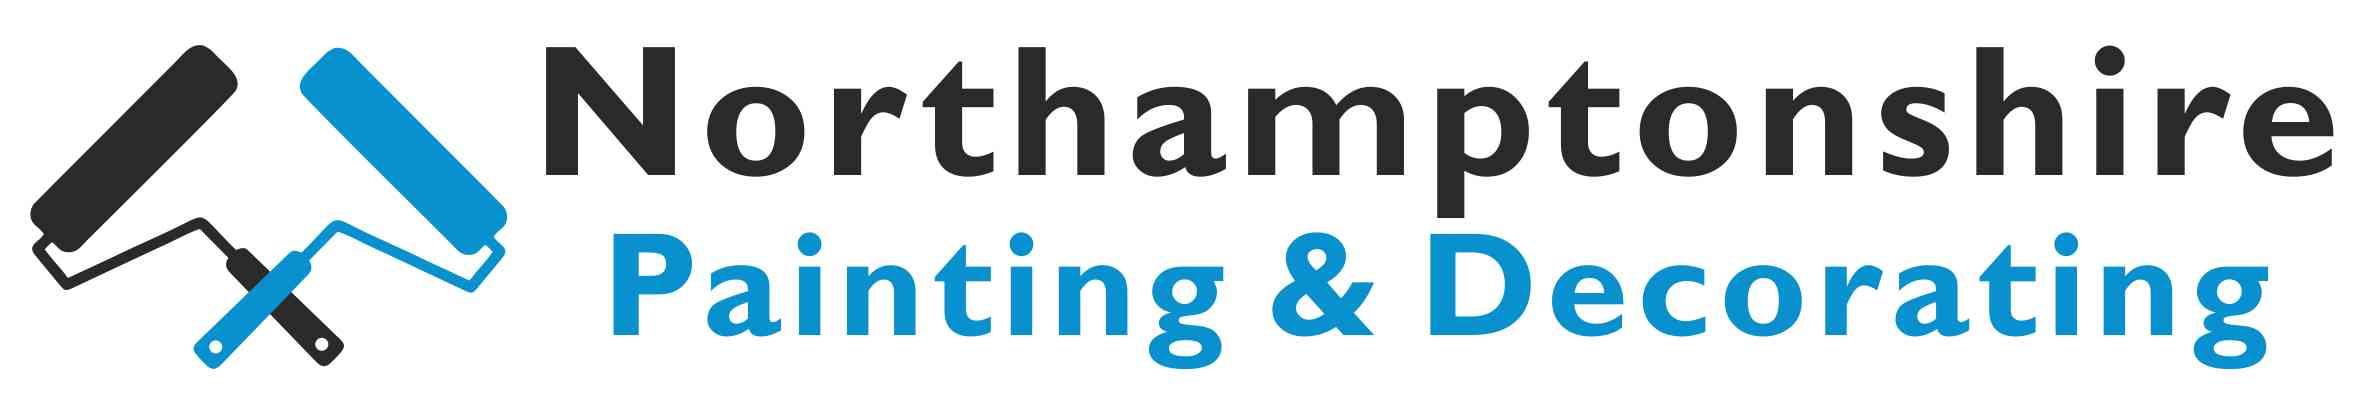 Northamptonshire Painting & Decorating Verified Logo